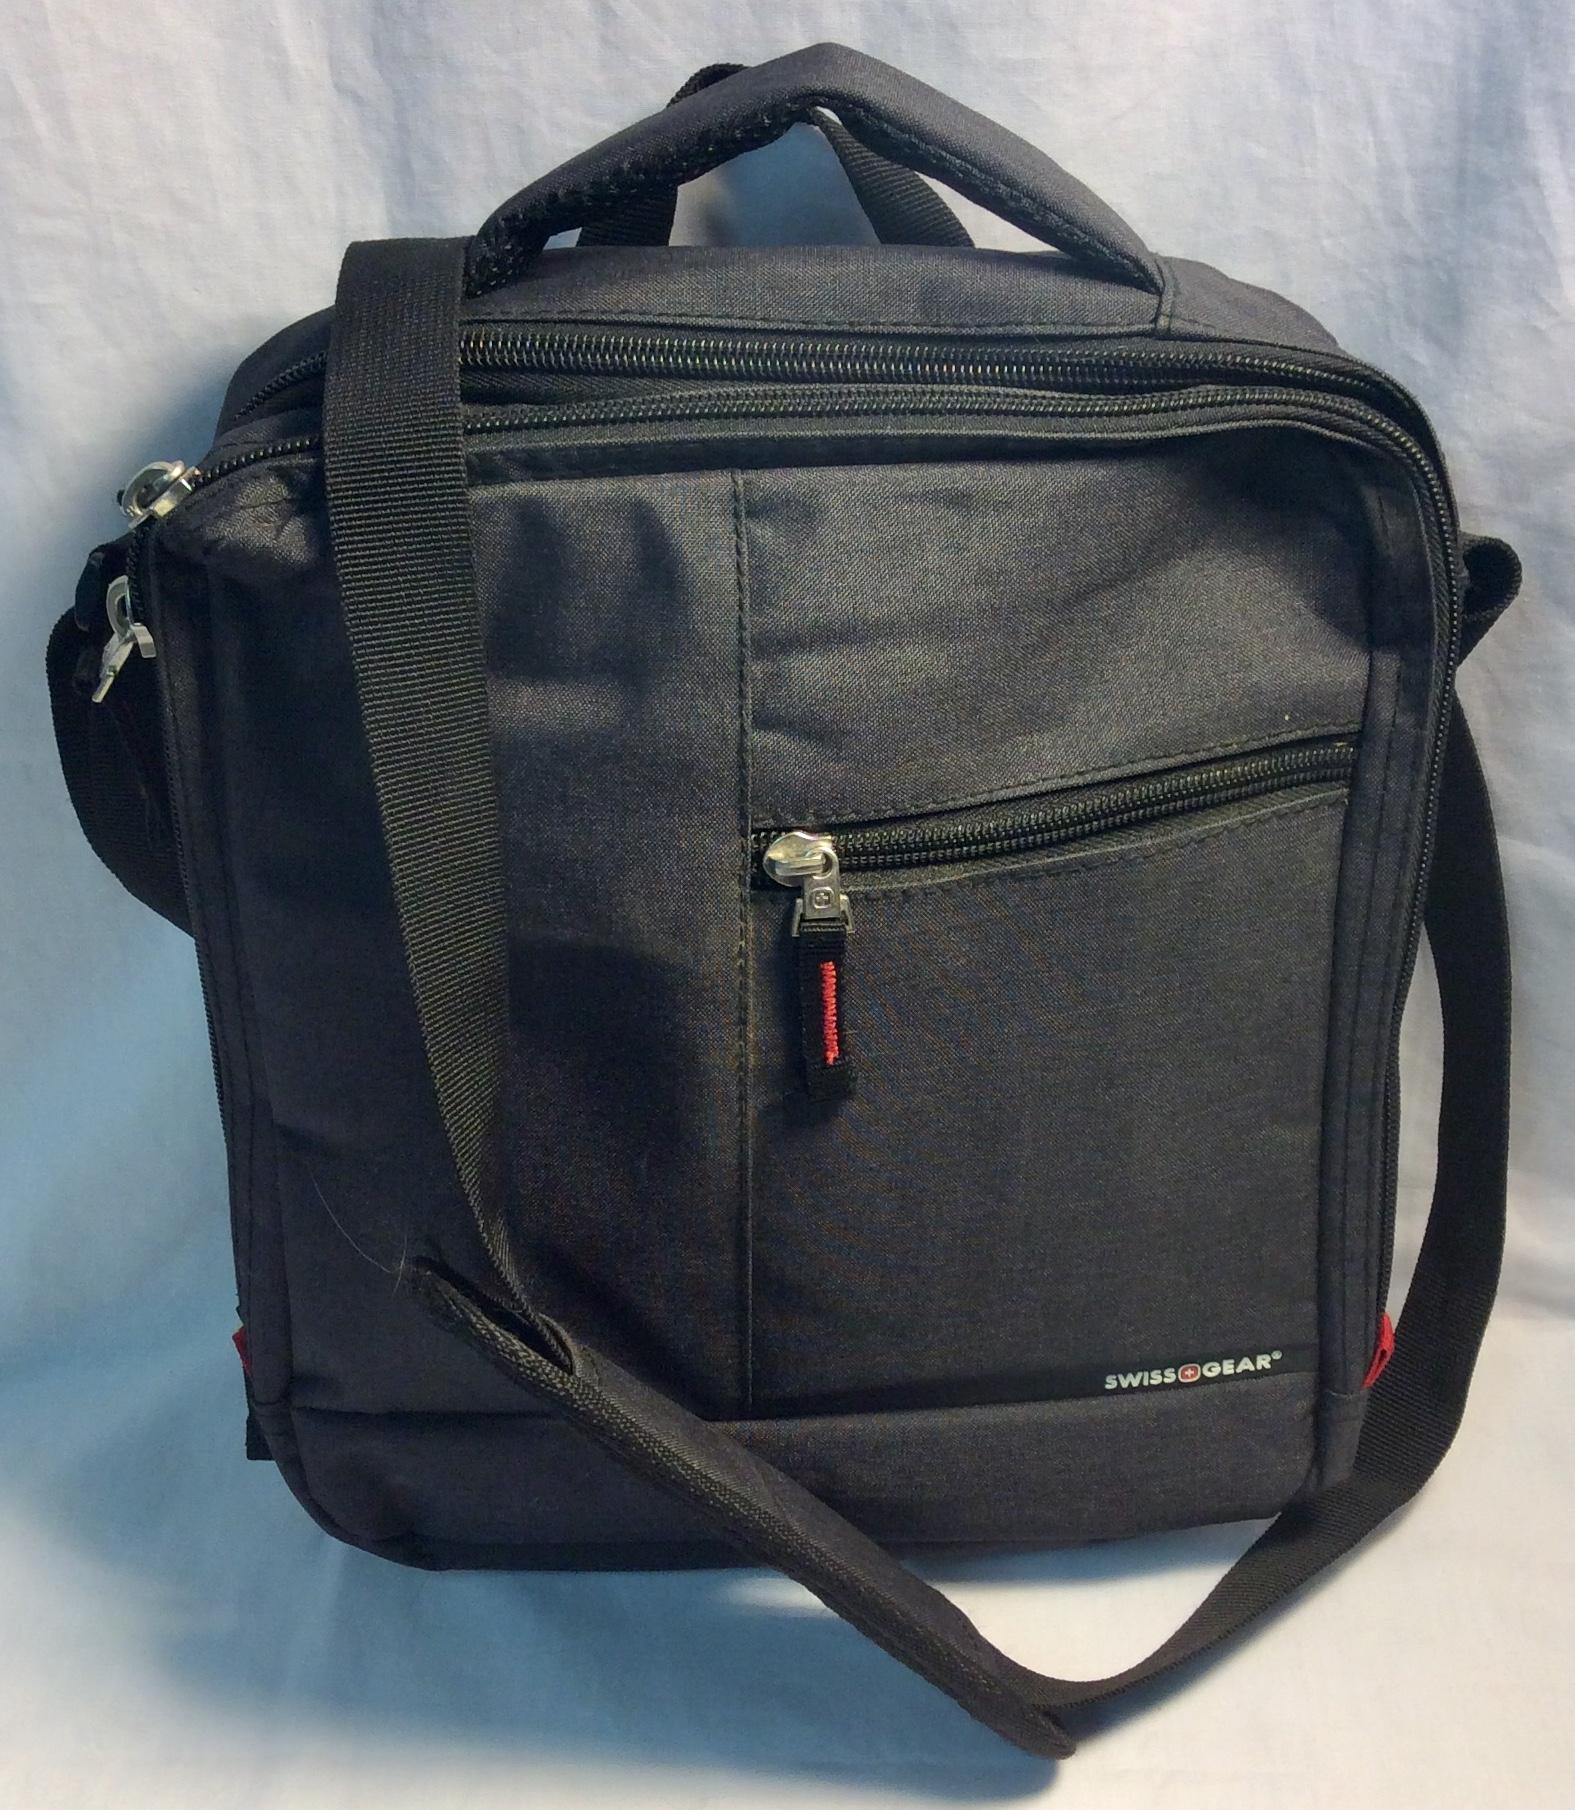 Swiss Gear Small grey bag